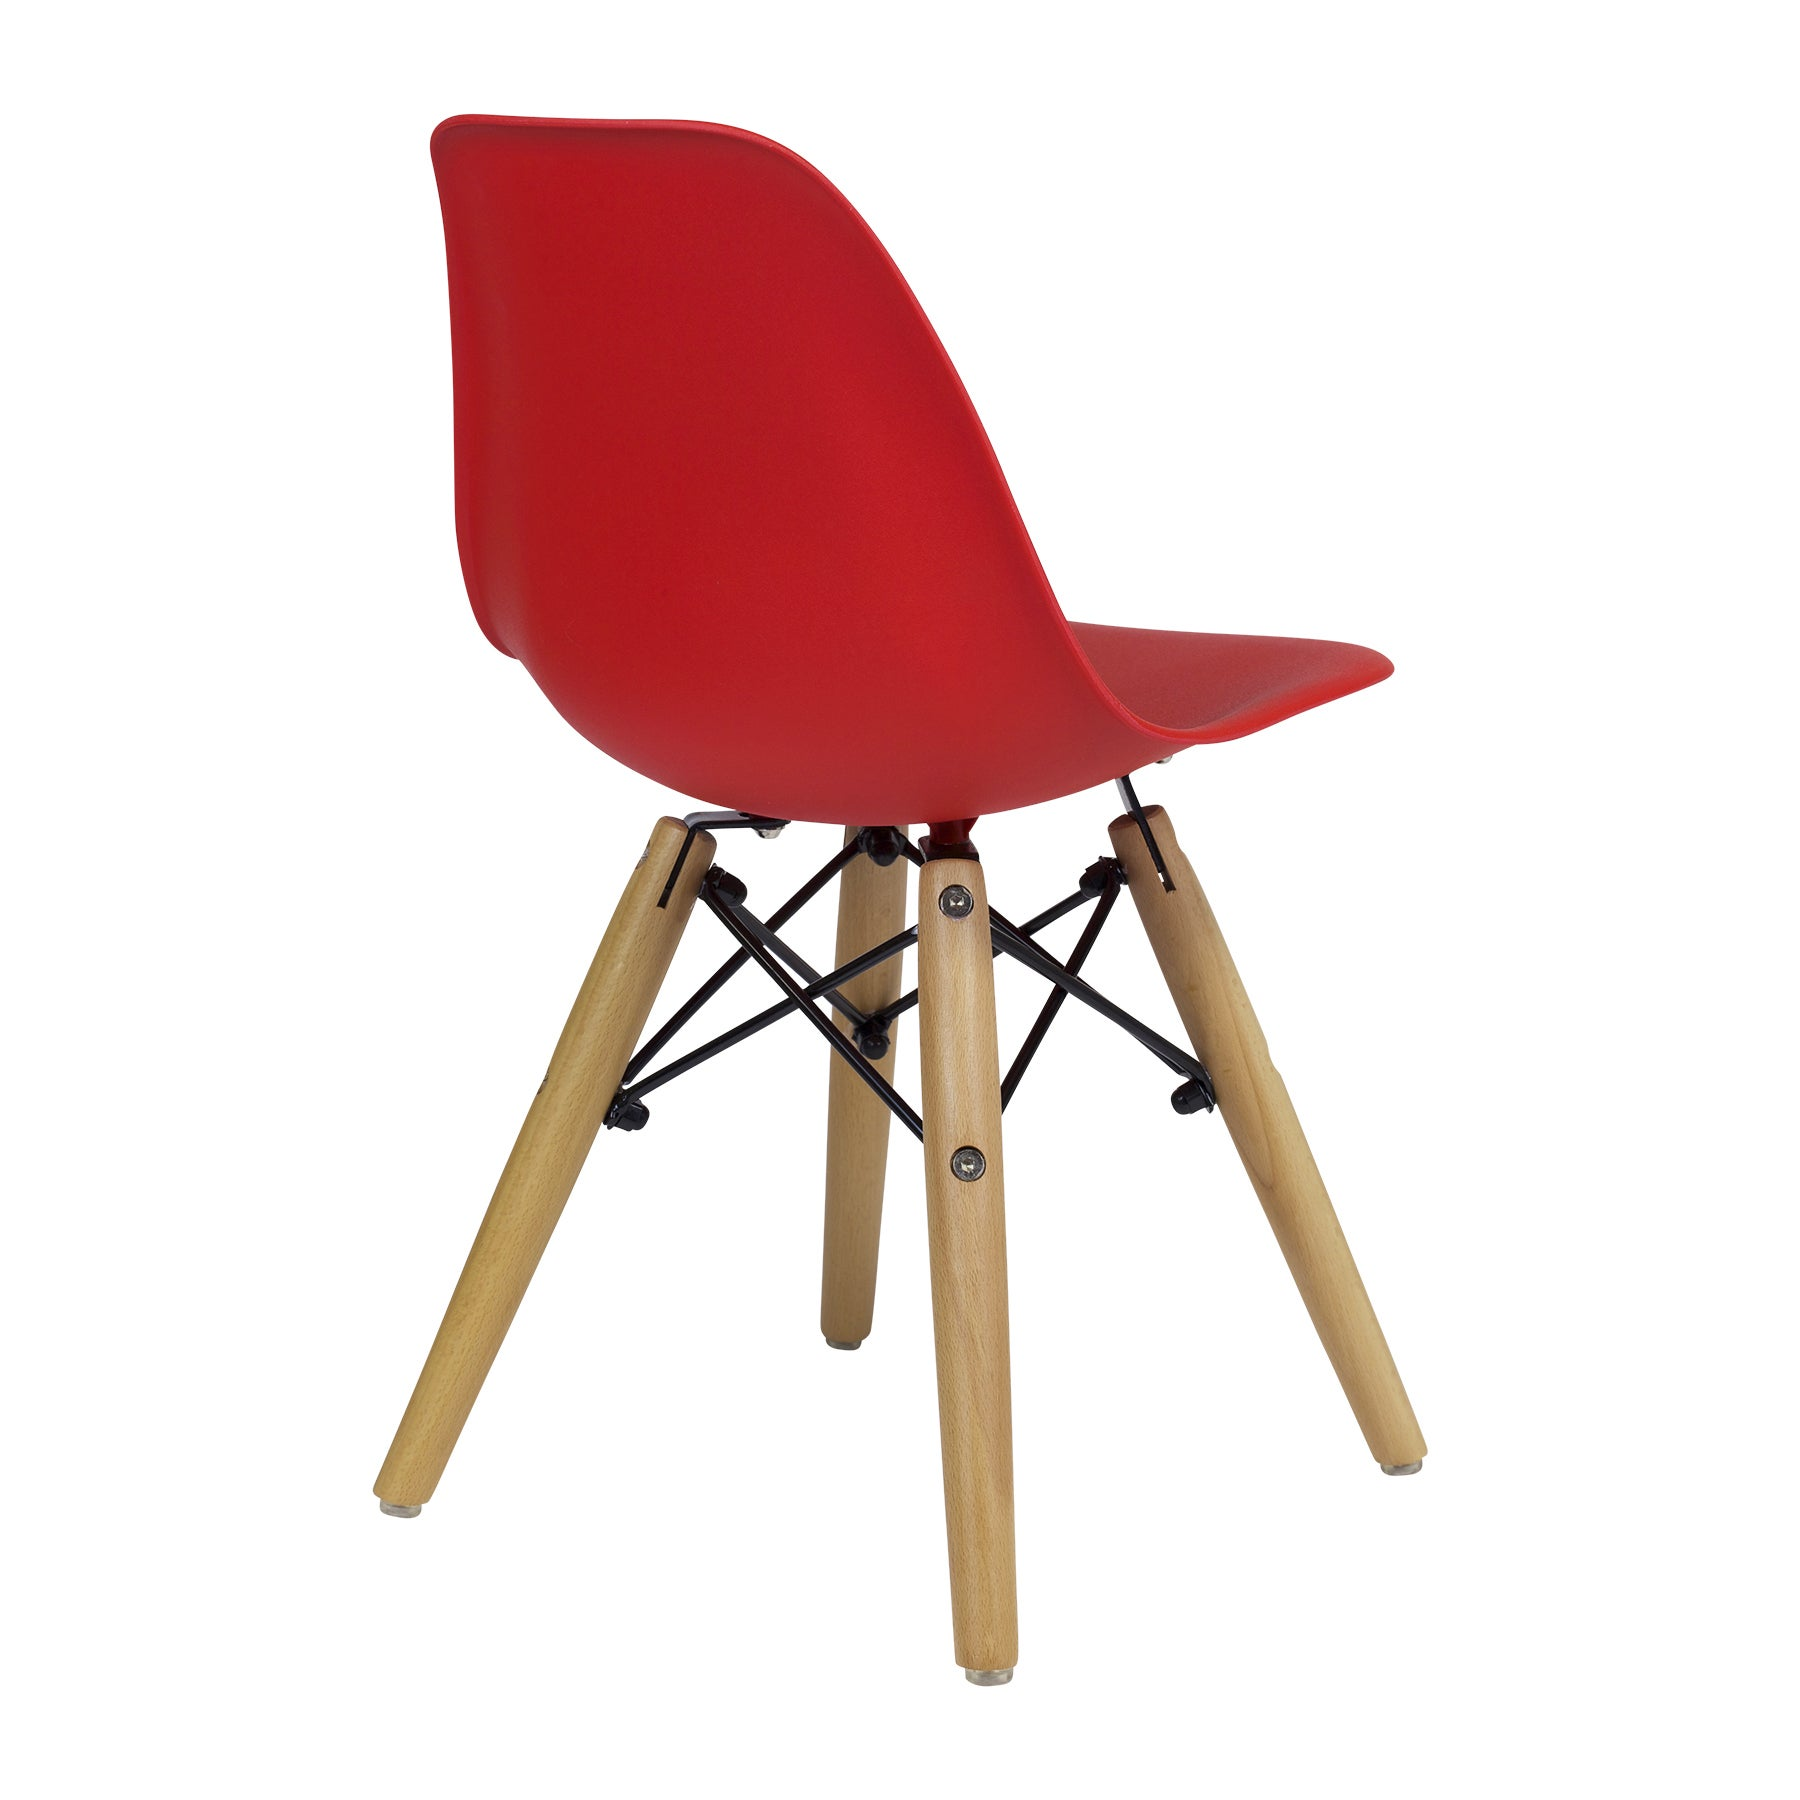 Genial Shop Handmade Mid Century Modern Kidu0027s Dining Chair (China)   On Sale    Free Shipping Today   Overstock.com   13190899